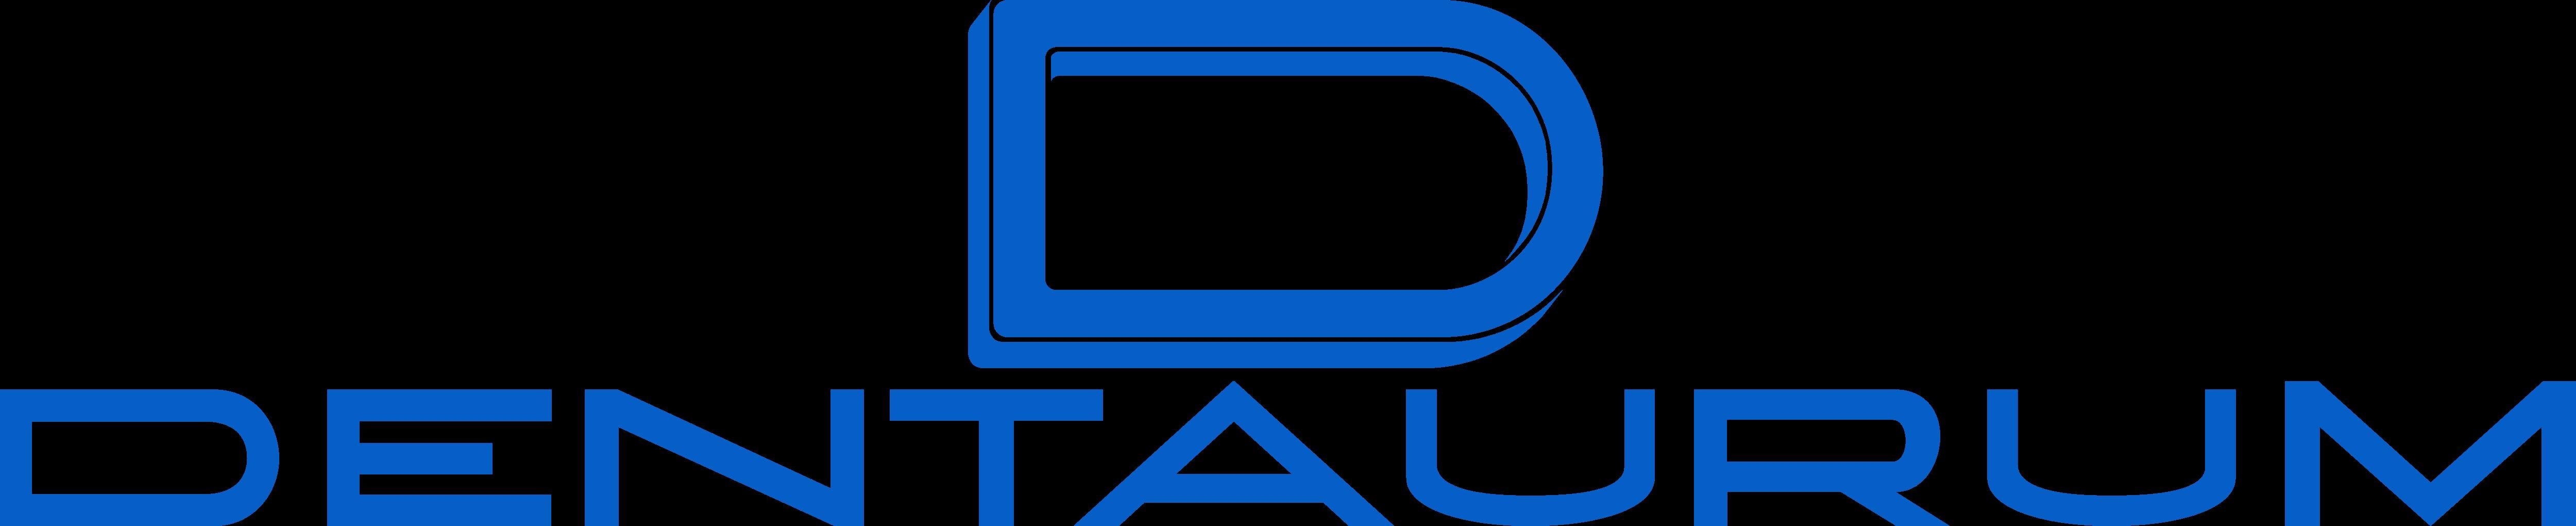 Dentaurum – Logos Download